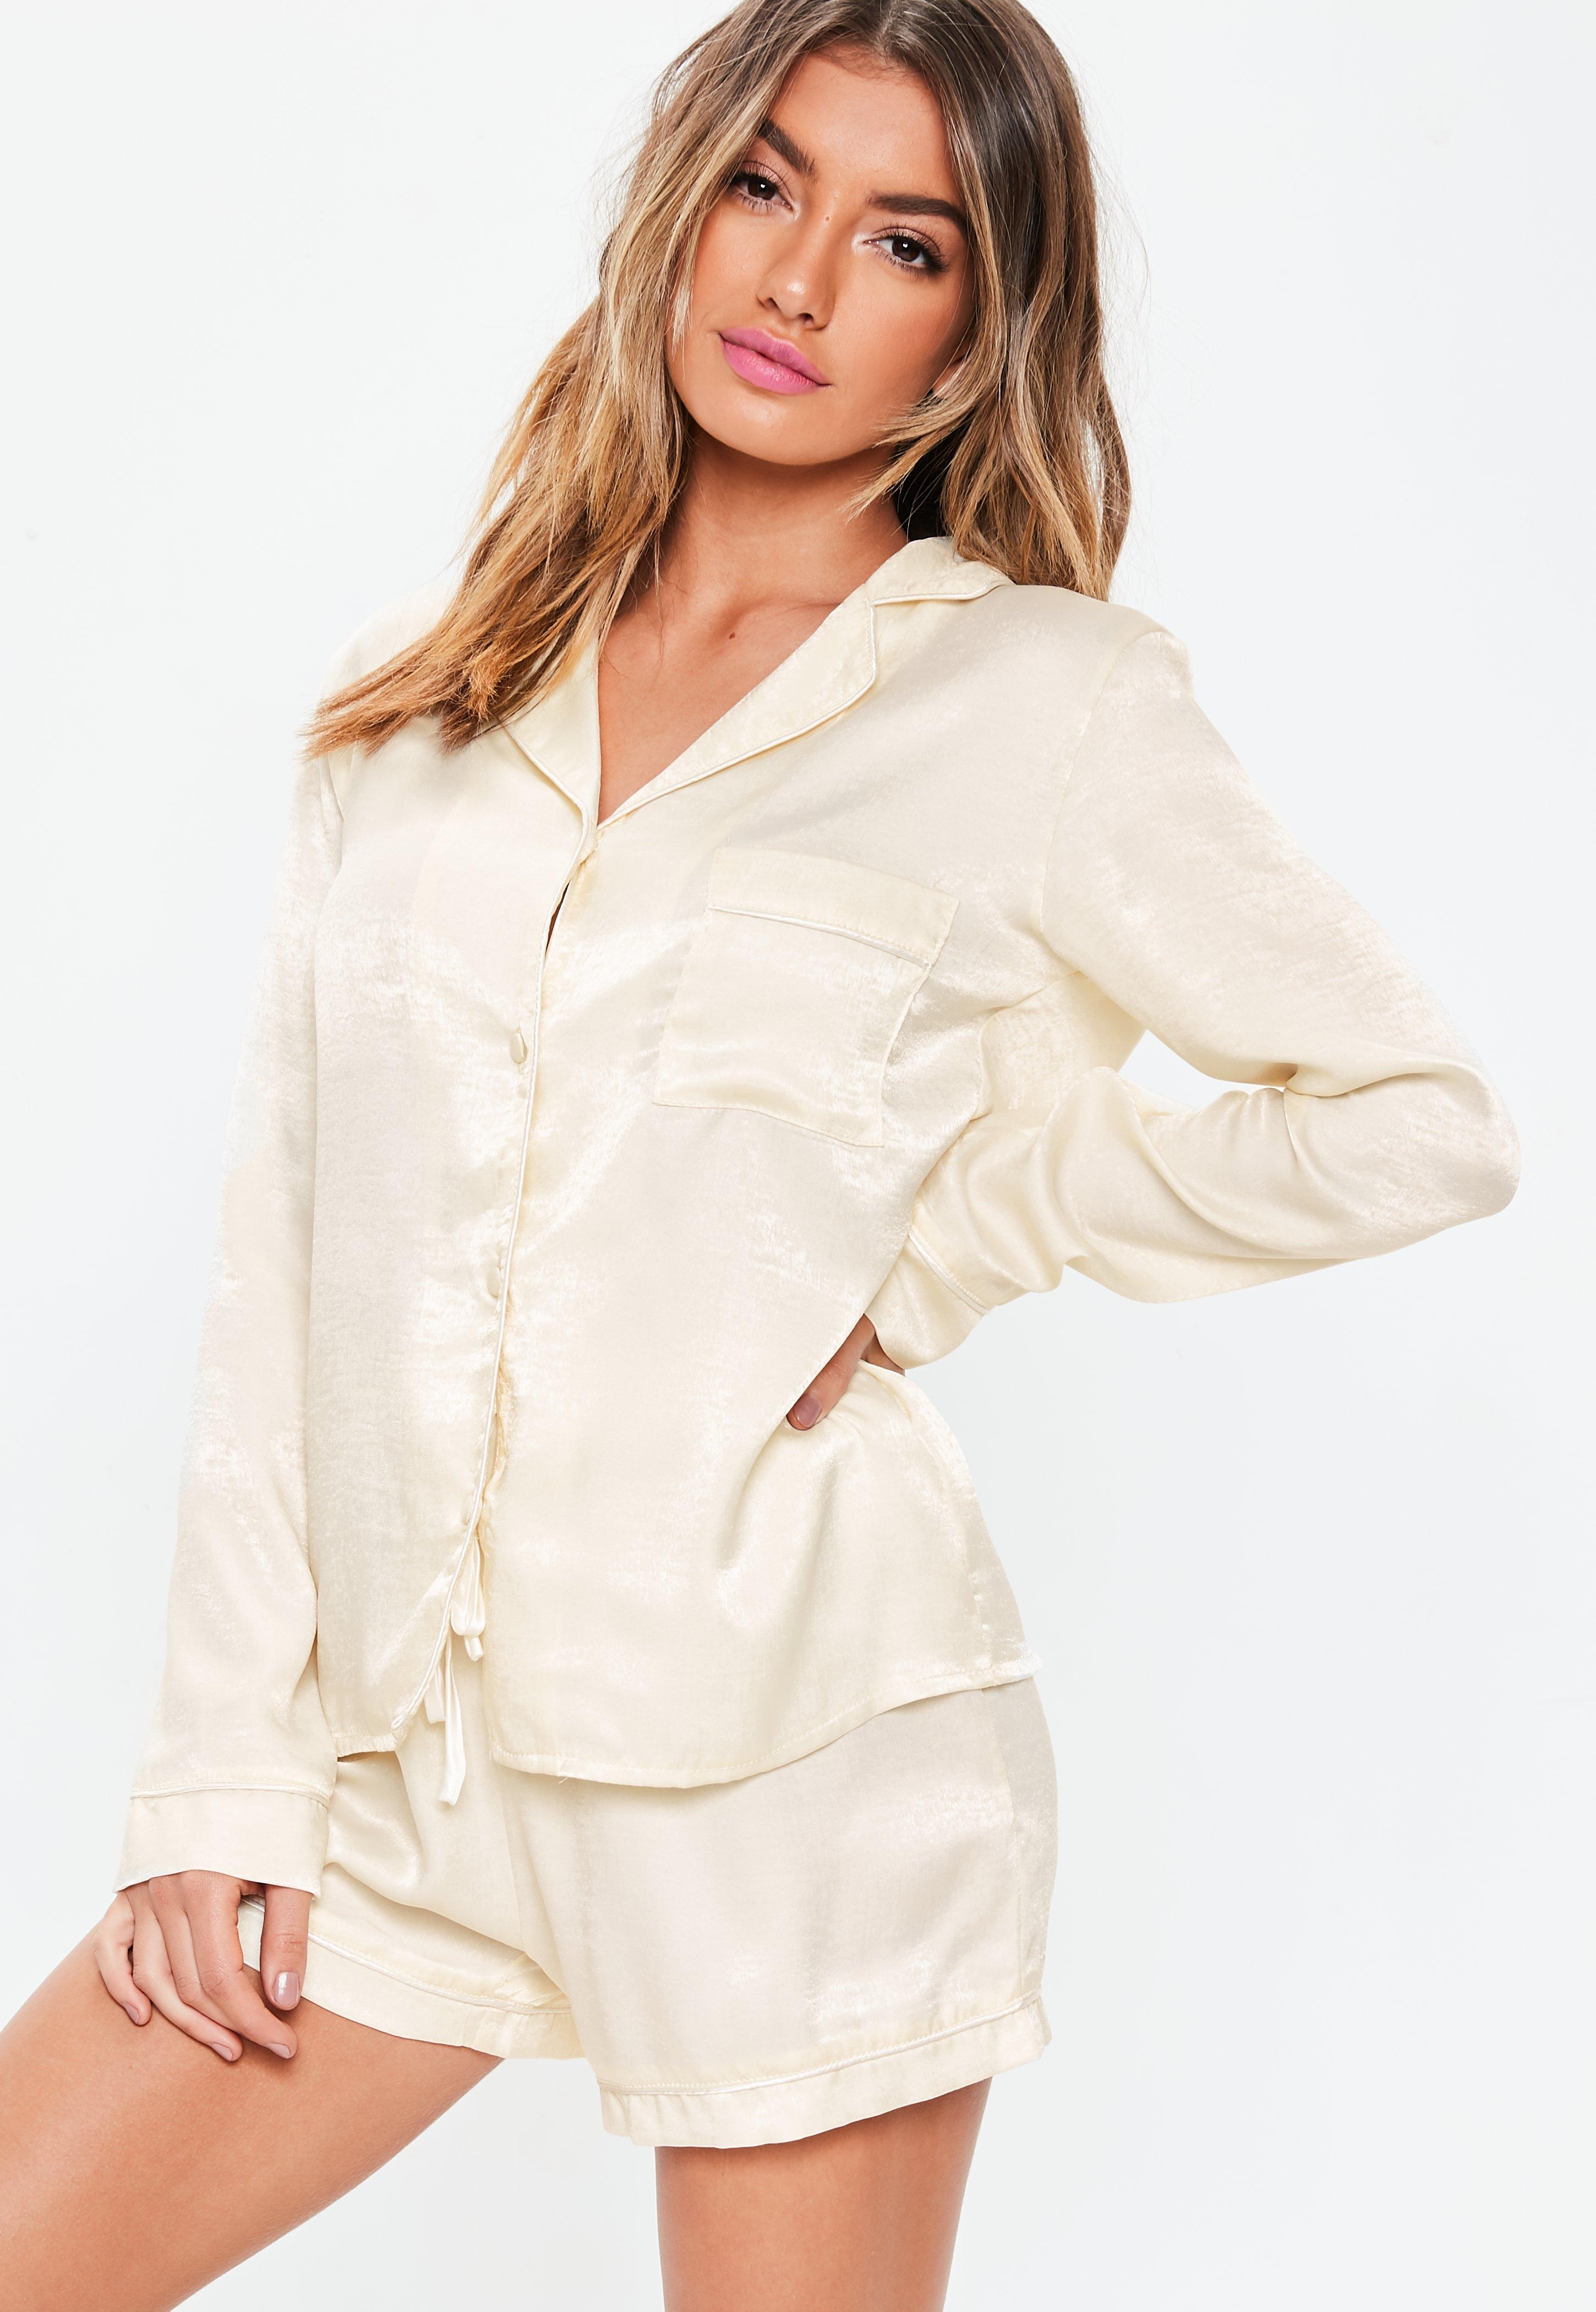 5870469f71f3 Lyst - Missguided Cream Satin Long Sleeve Pyjama Set in Natural